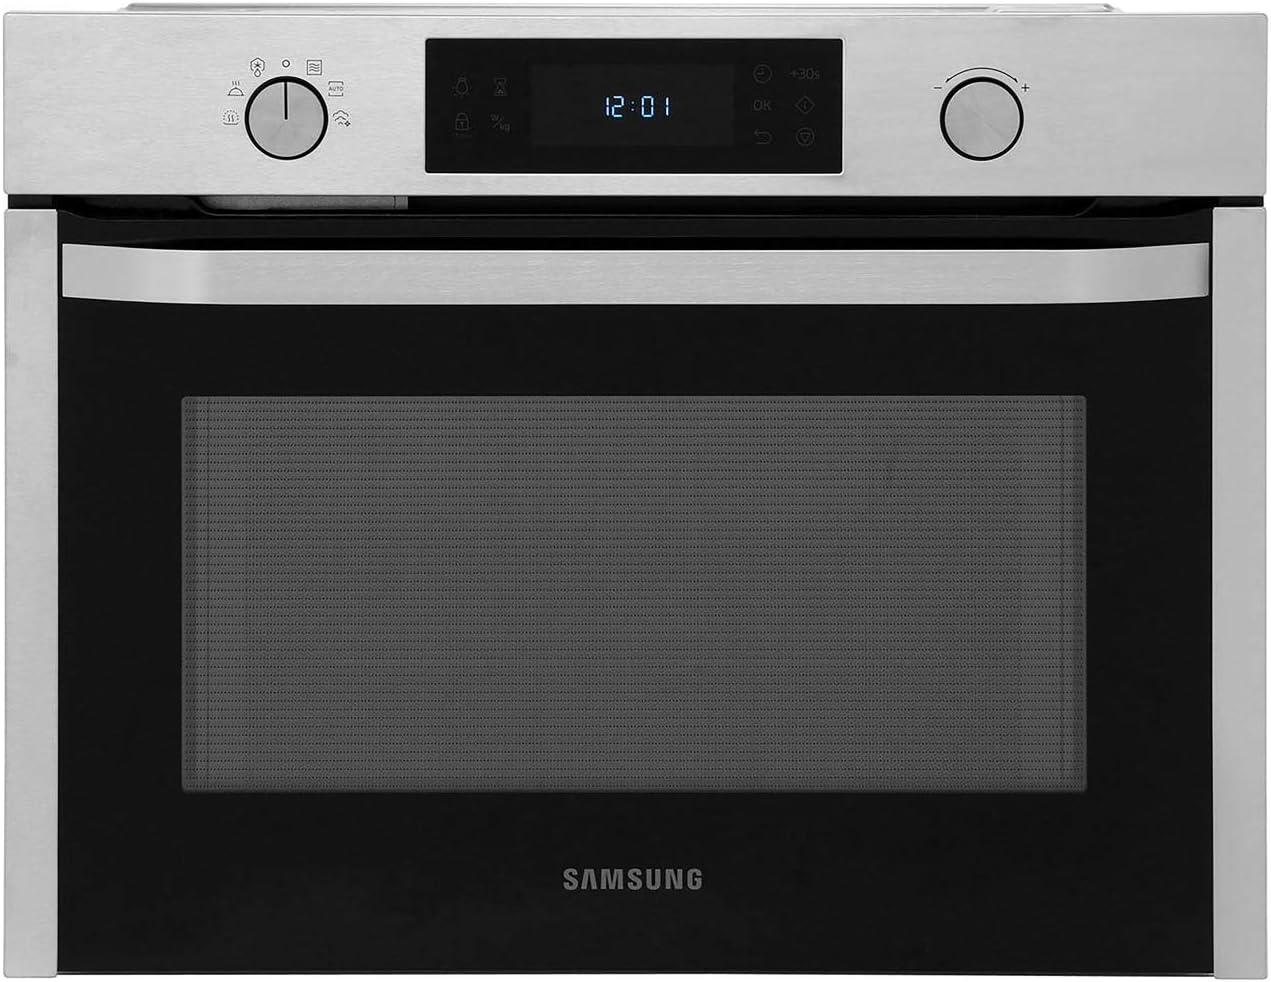 Samsung Horno multifunción empotrable nq50K3130bs Acabado Acero Inoxidable De 60cm